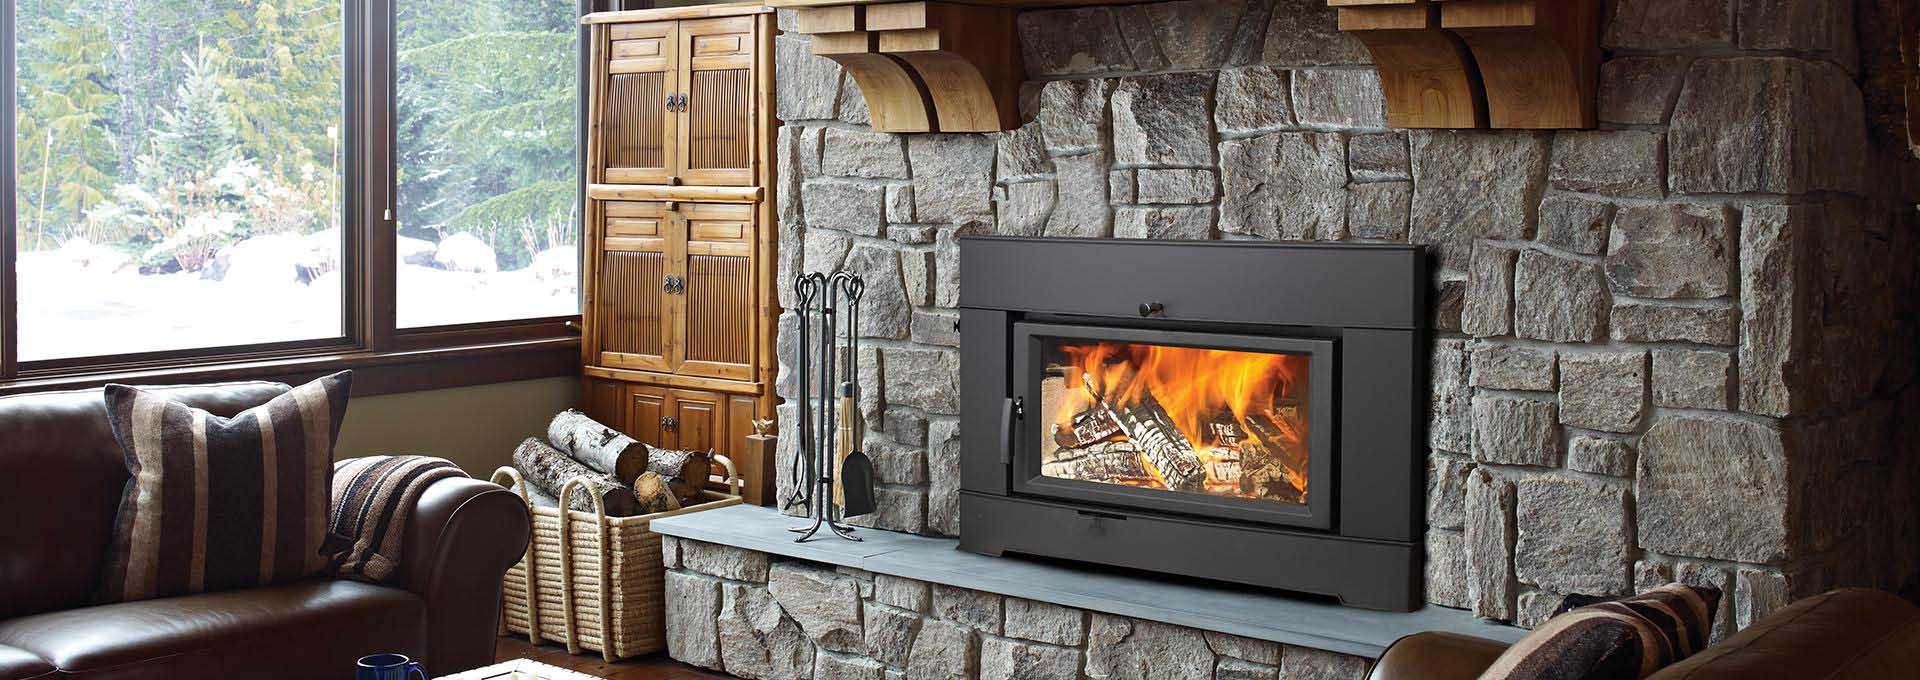 wood burning fireplace inserts regency fireplace products rh regency fire com best energy efficient fireplace inserts efficient fireplace insert wood burning